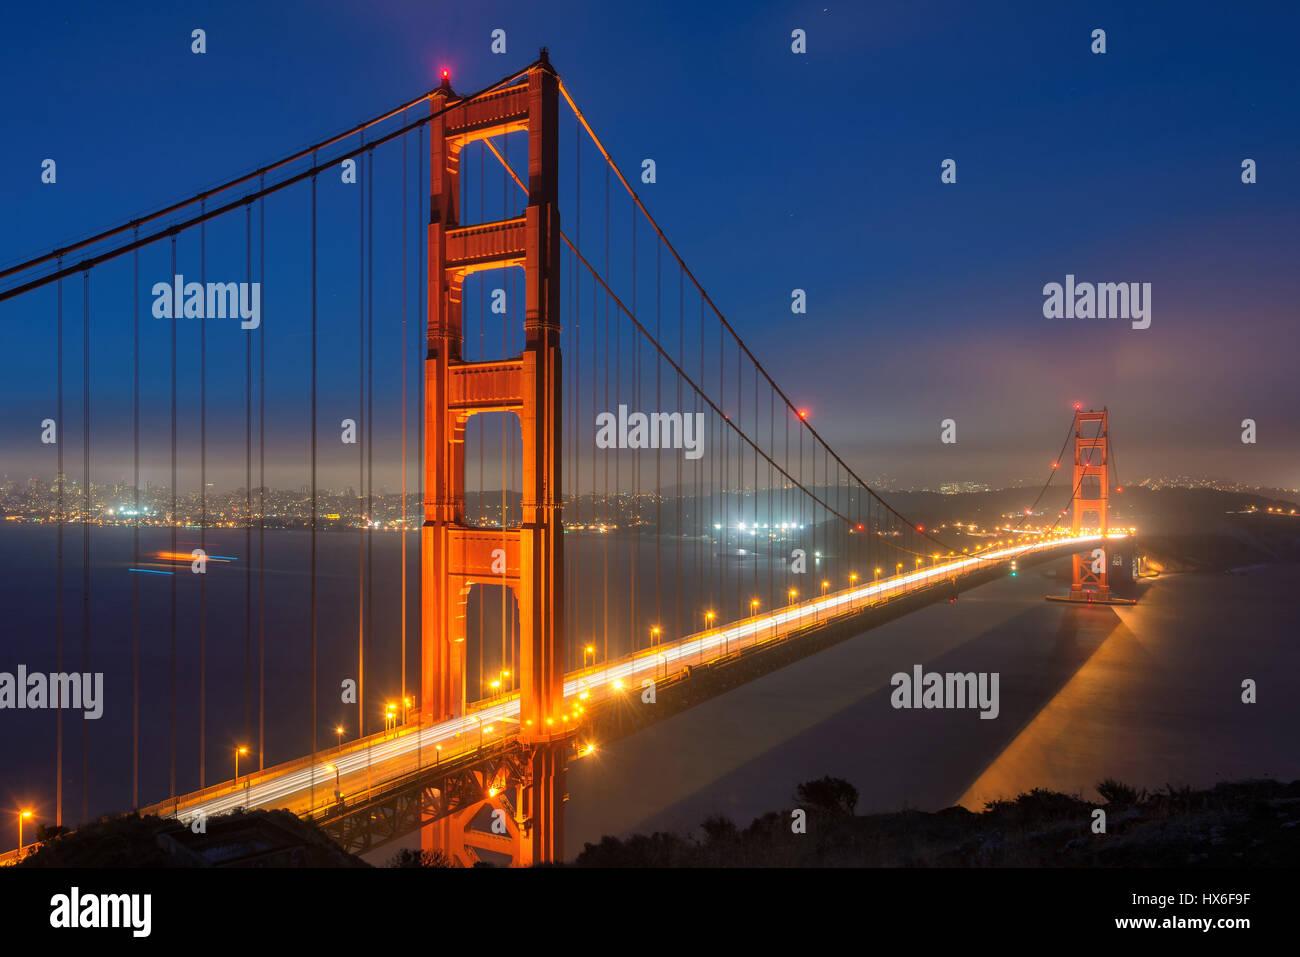 Golden Gate Bridge at night, San Francisco. Photo Stock